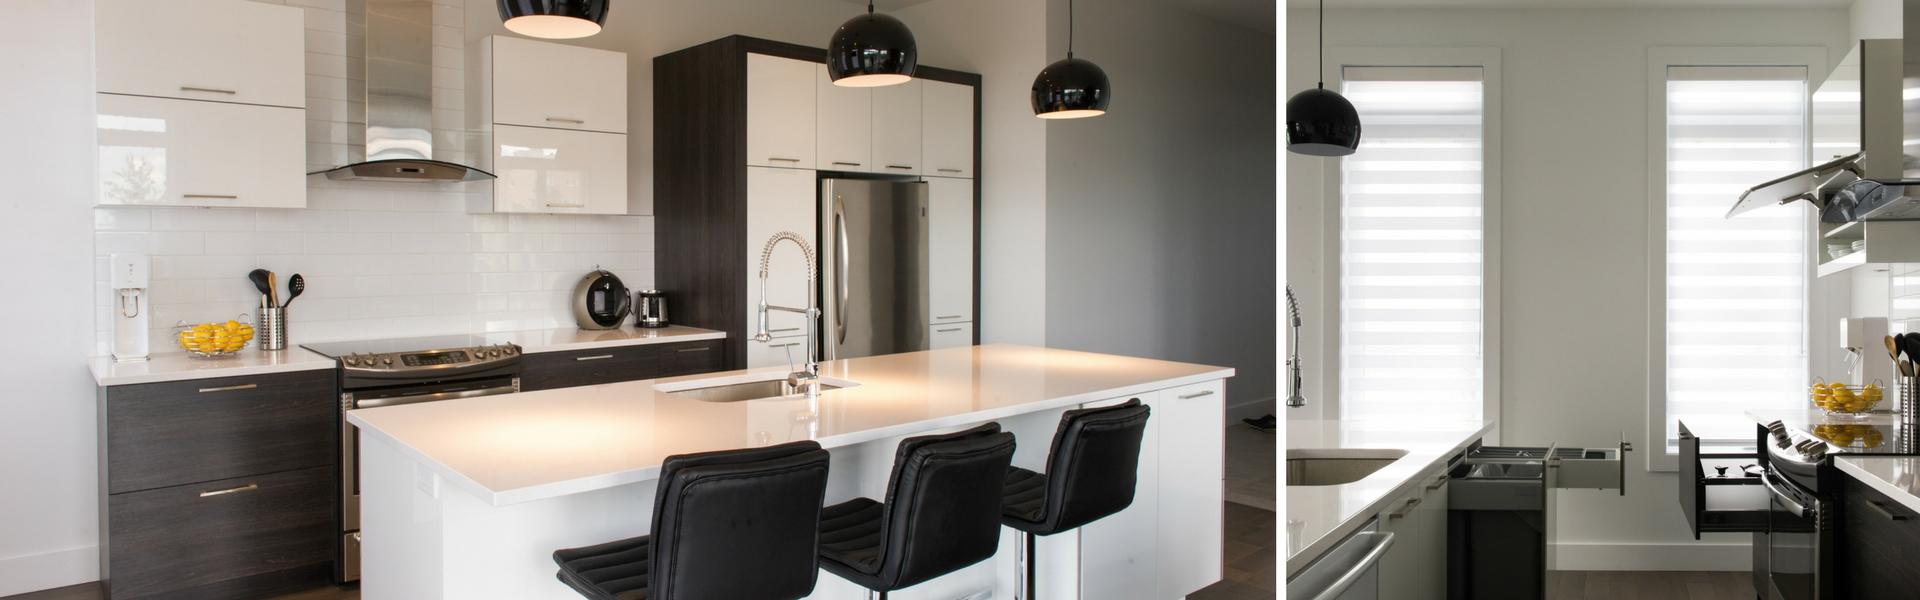 r nover sa cuisine resurfa age versus nouvelles armoires. Black Bedroom Furniture Sets. Home Design Ideas